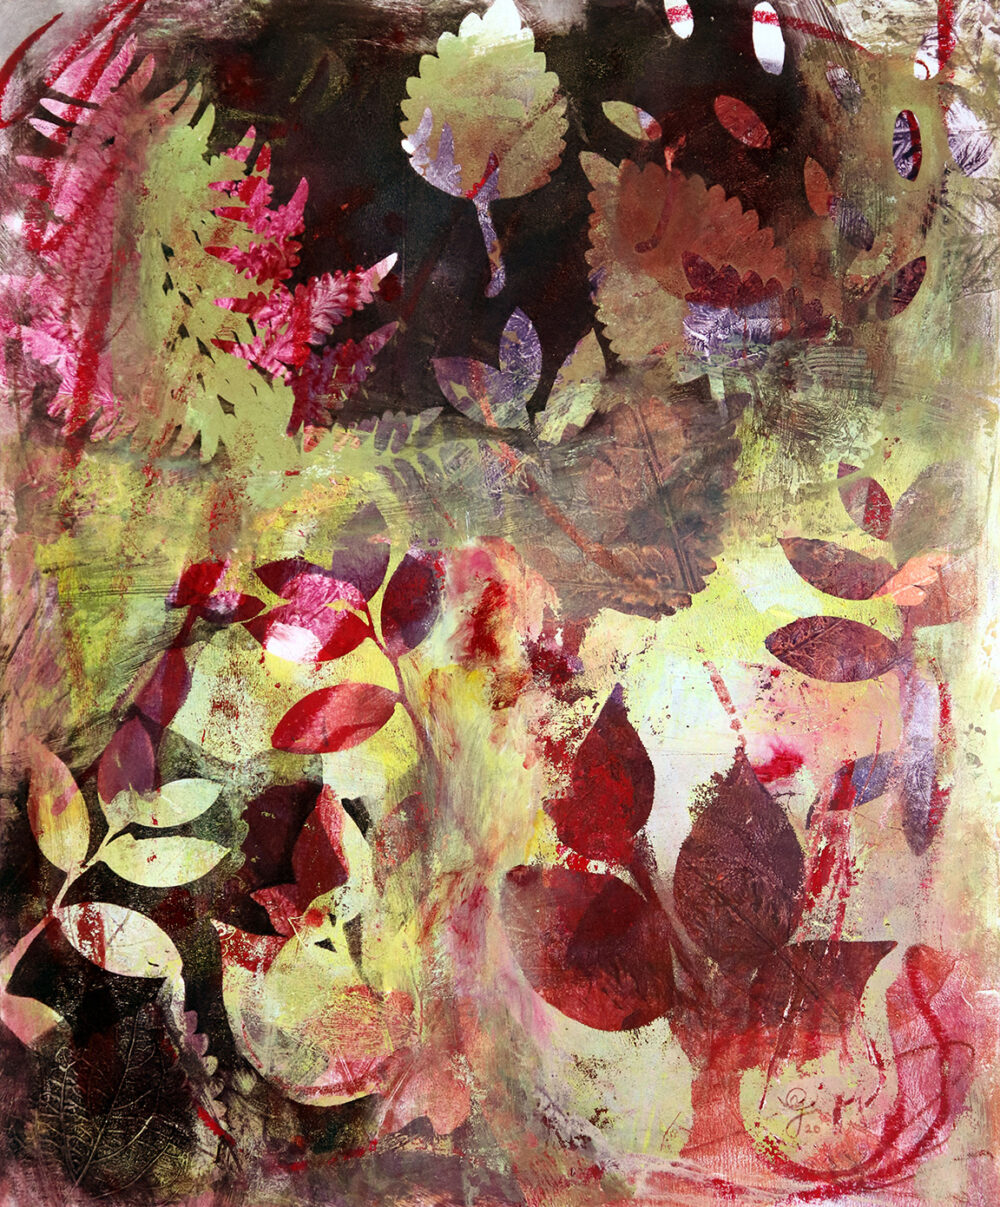 peinture-passion-abstrait-botanique-artiste-peintre-carine-genadry